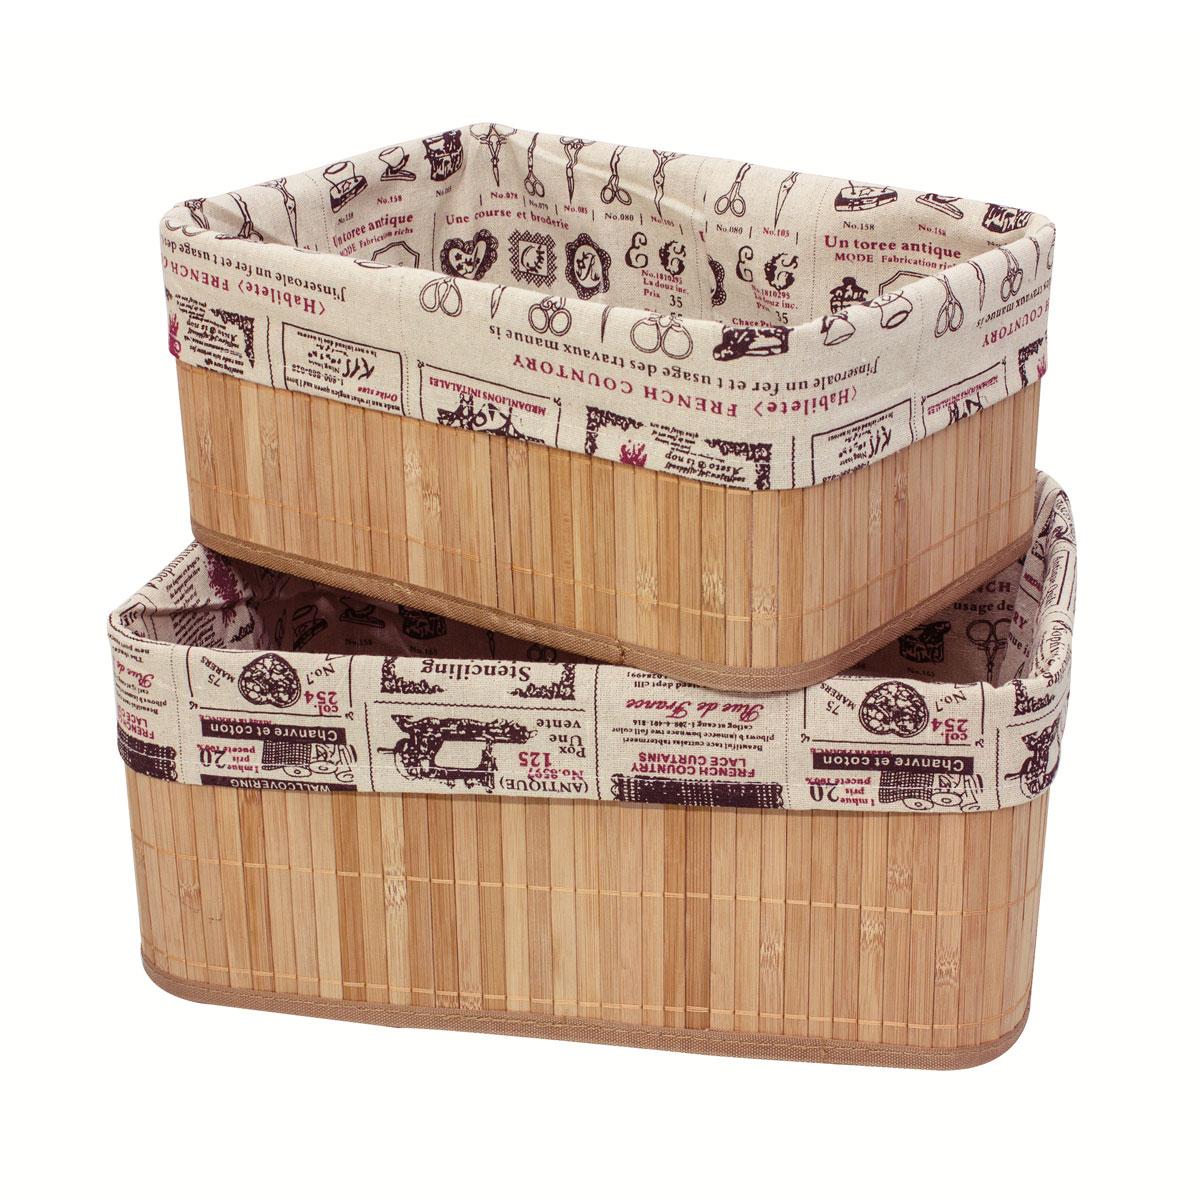 Набор коробов для хранения Ecowoo Ретро, цвет: светлое дерево, 2 шт коробки для хранения ecowoo ящики для хранения